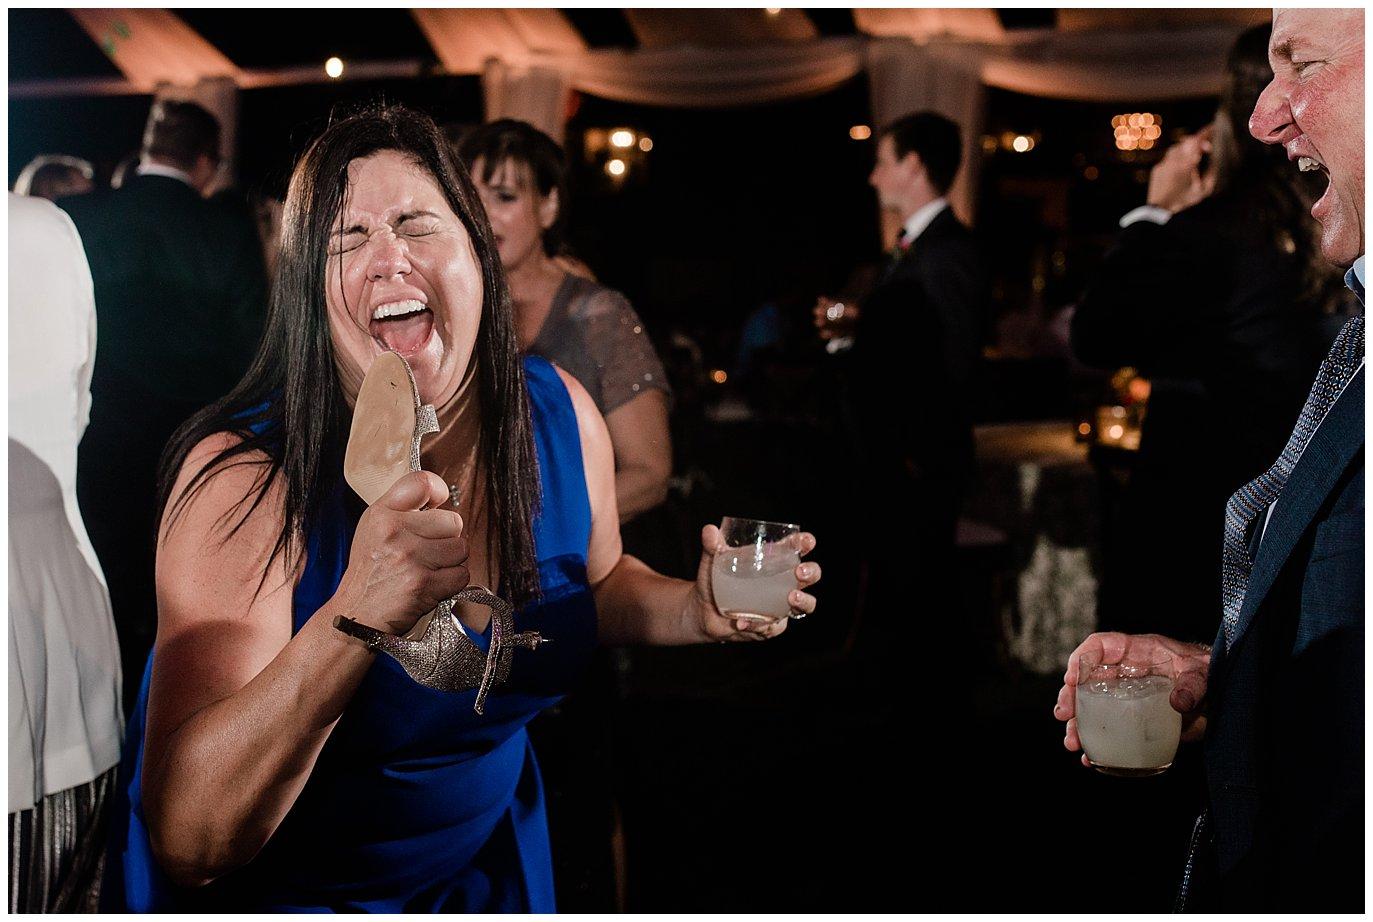 crazy wedding guest dancing photo